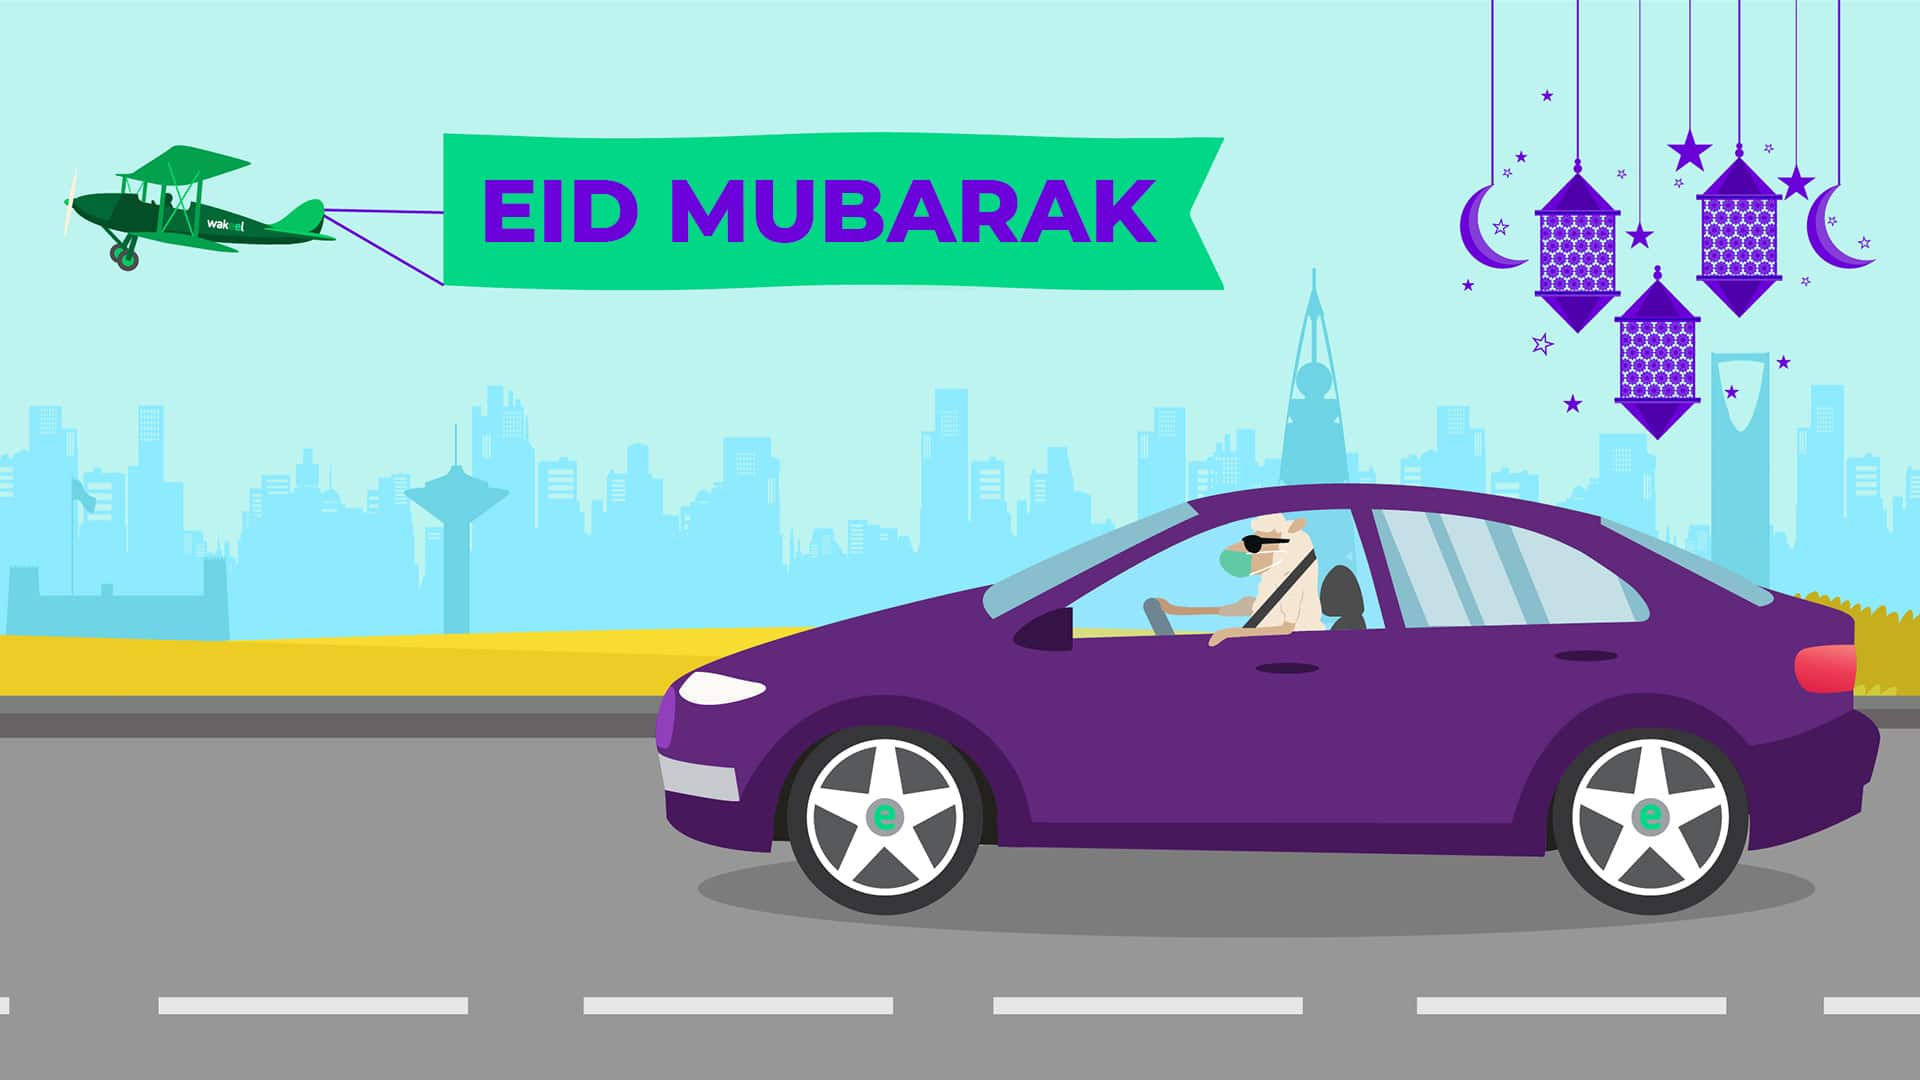 Celebrating Eid al-Adha with a Pandemic